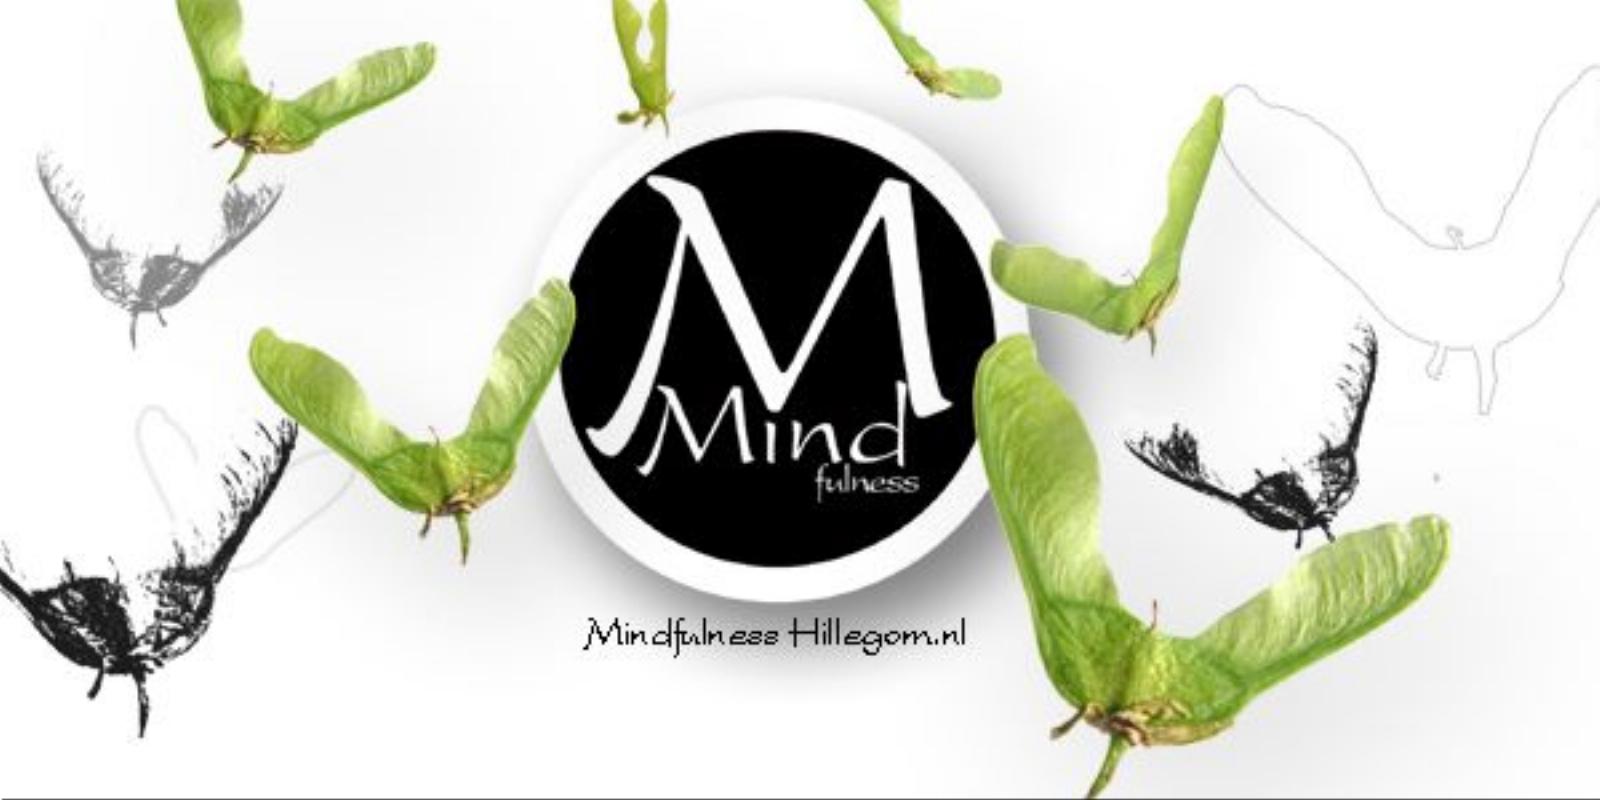 Mindfulness Hillegom